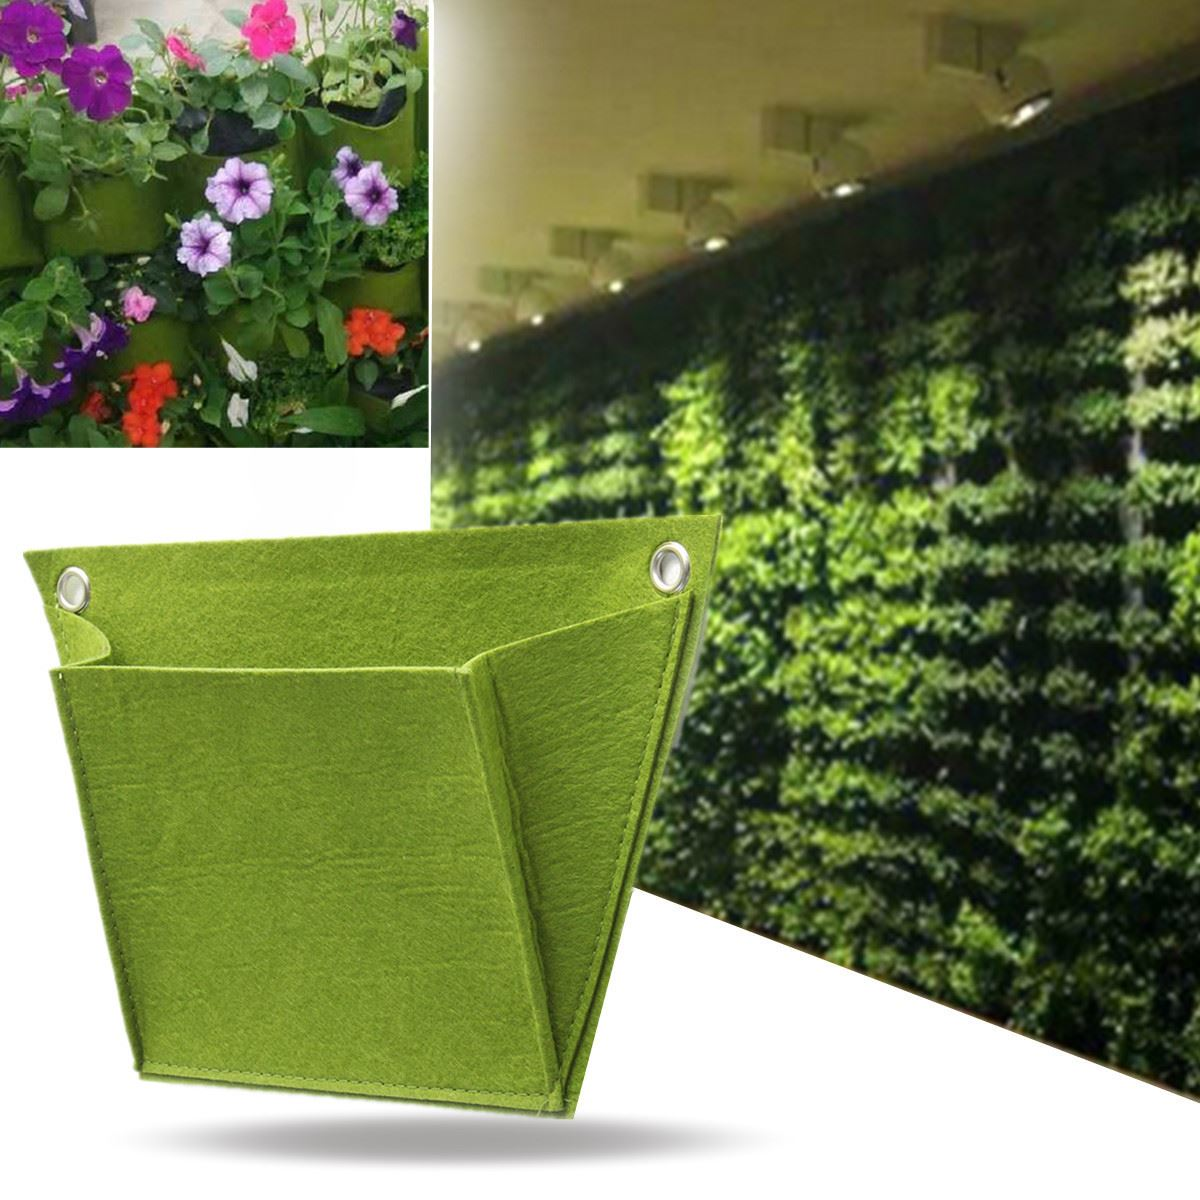 Living Wall Planter popular living wall planters indoor-buy cheap living wall planters